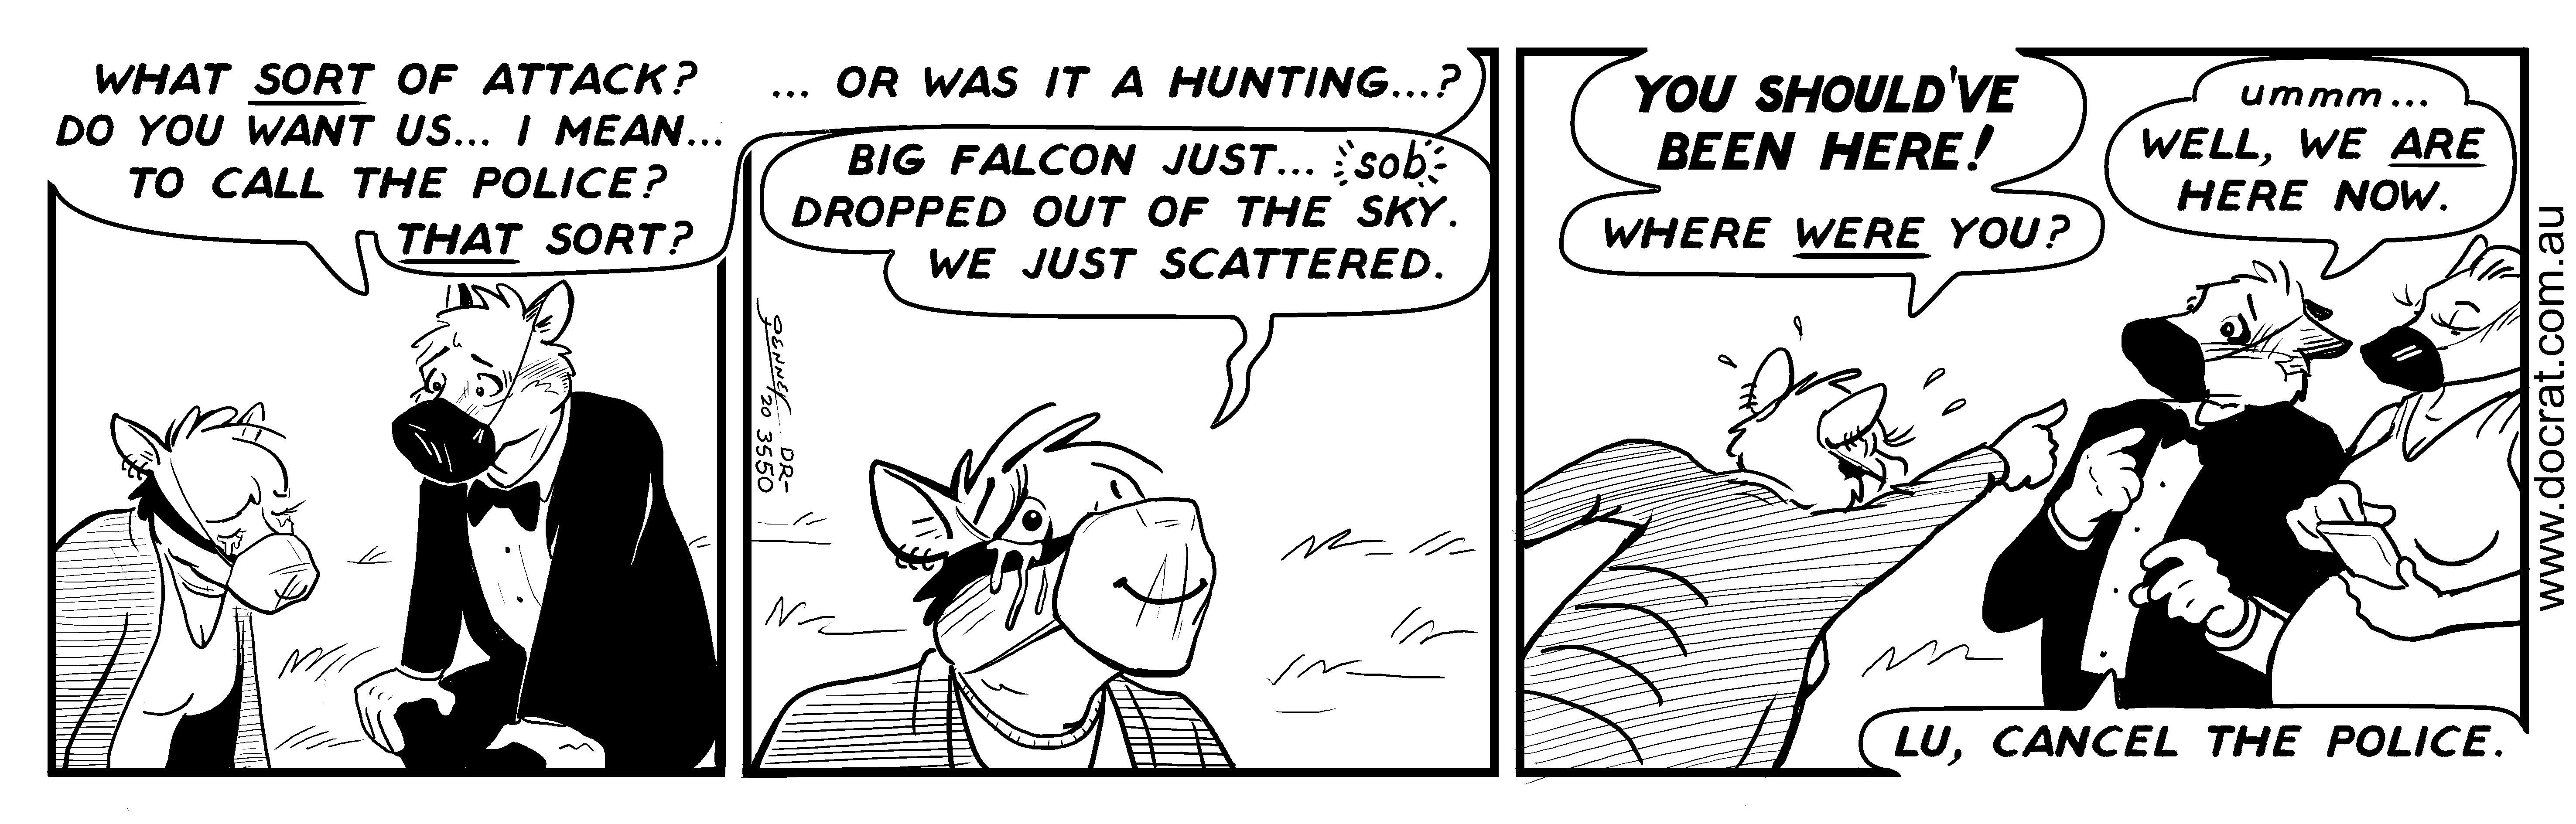 20200821